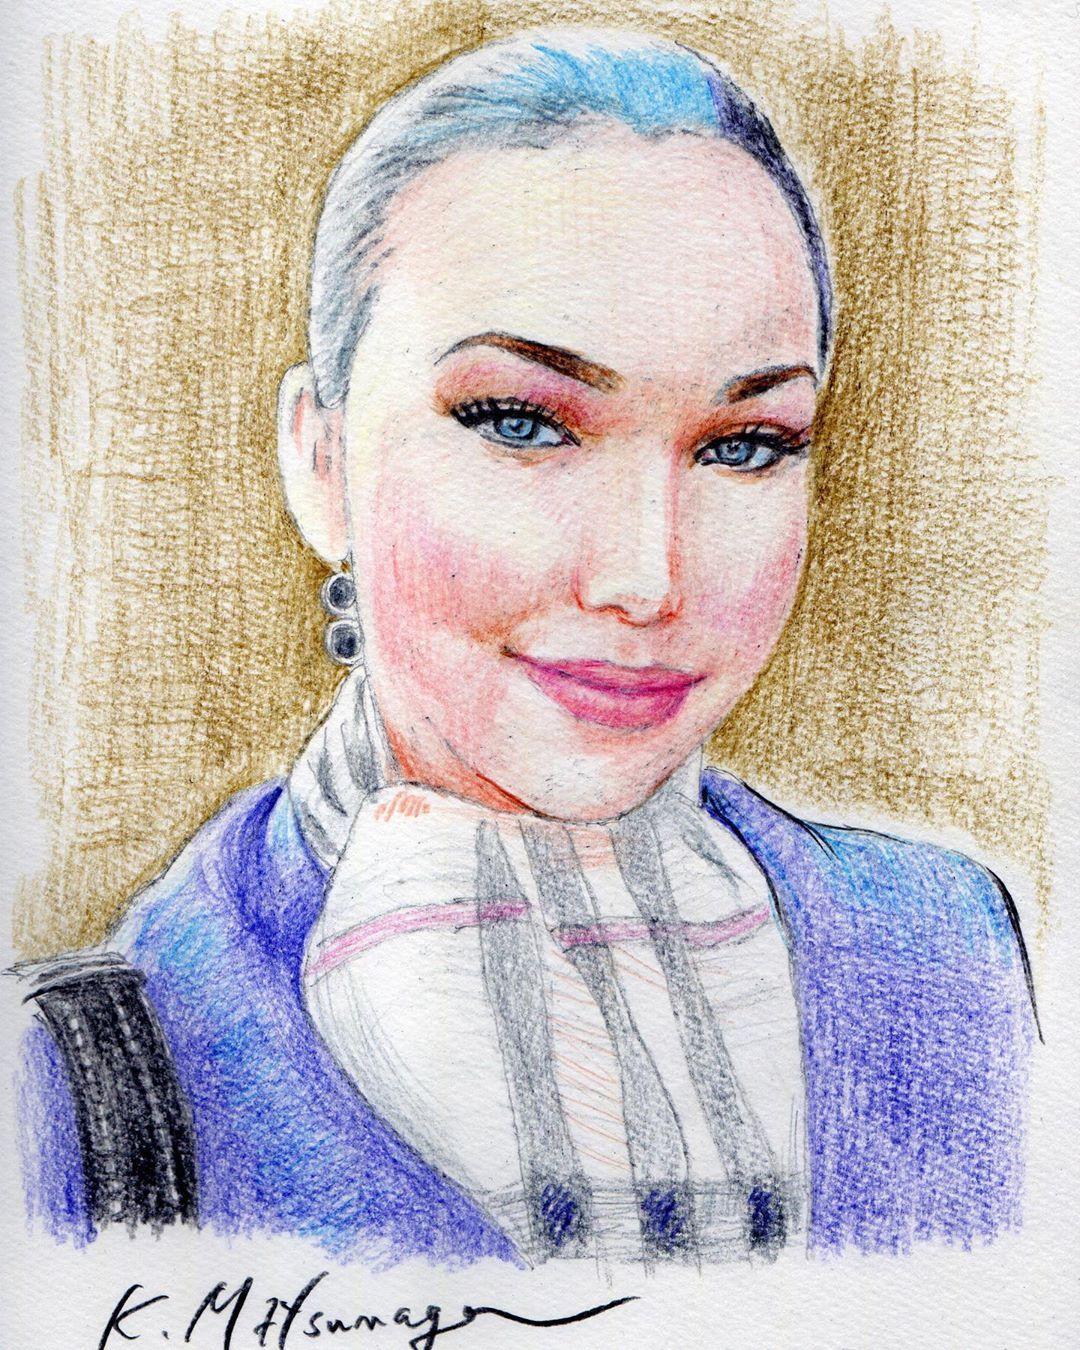 #instaart #instagood  #art @lizea_06 #lady #illustration #portrait #pencildrawing #coloredpencil #coloredpencil_art #slowart #friend #respect #thanks #色鉛筆アート #色鉛筆画 #肖像画 #idrawtheair